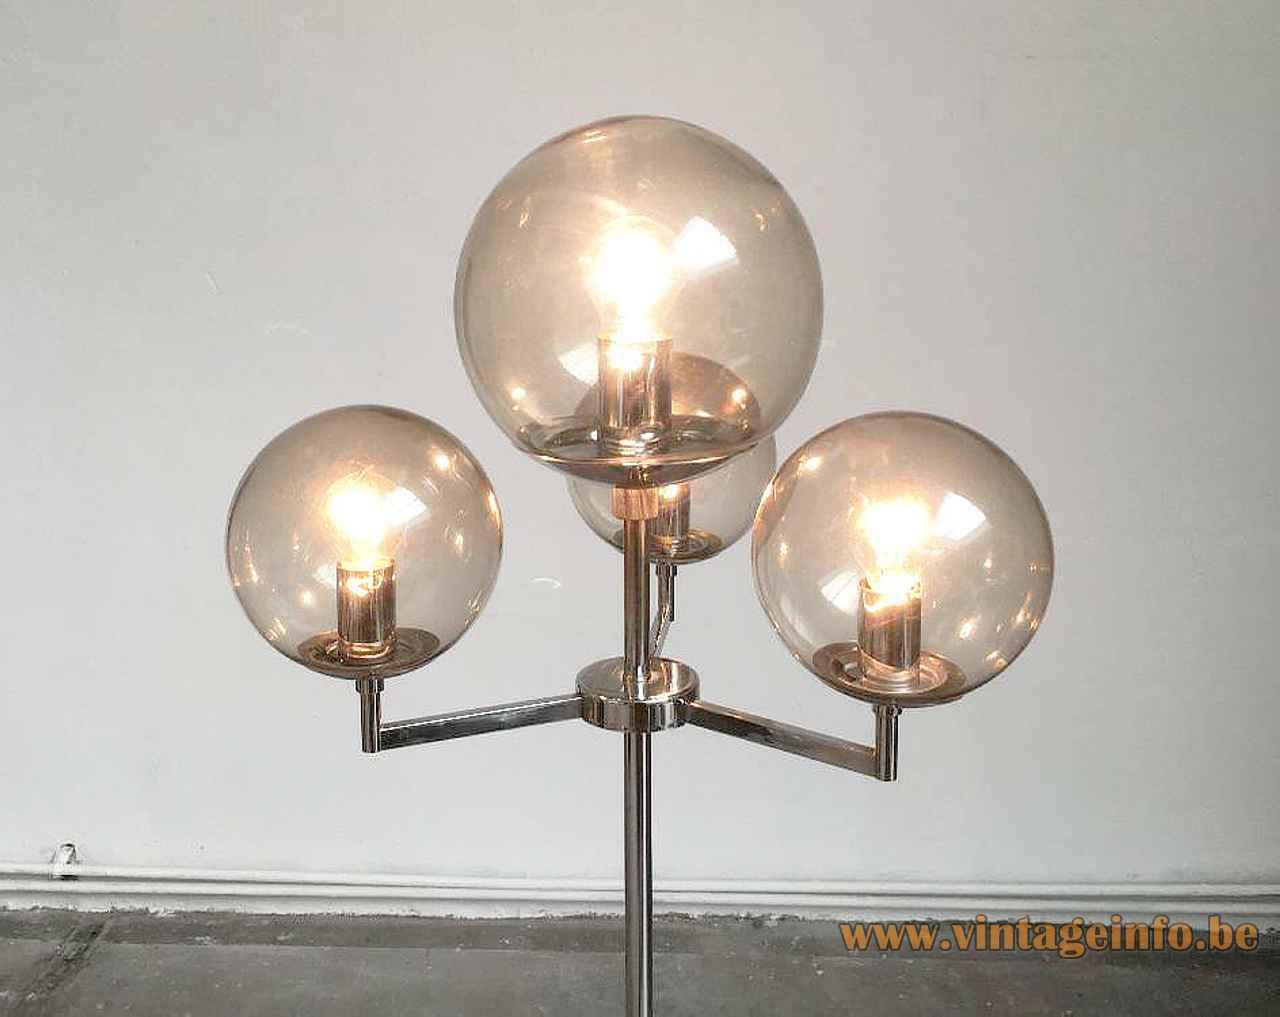 Hustadt Leuchten smoked globes floor lamp chrome rods 4 glass sphere lampshades 1960s 1970s Germany